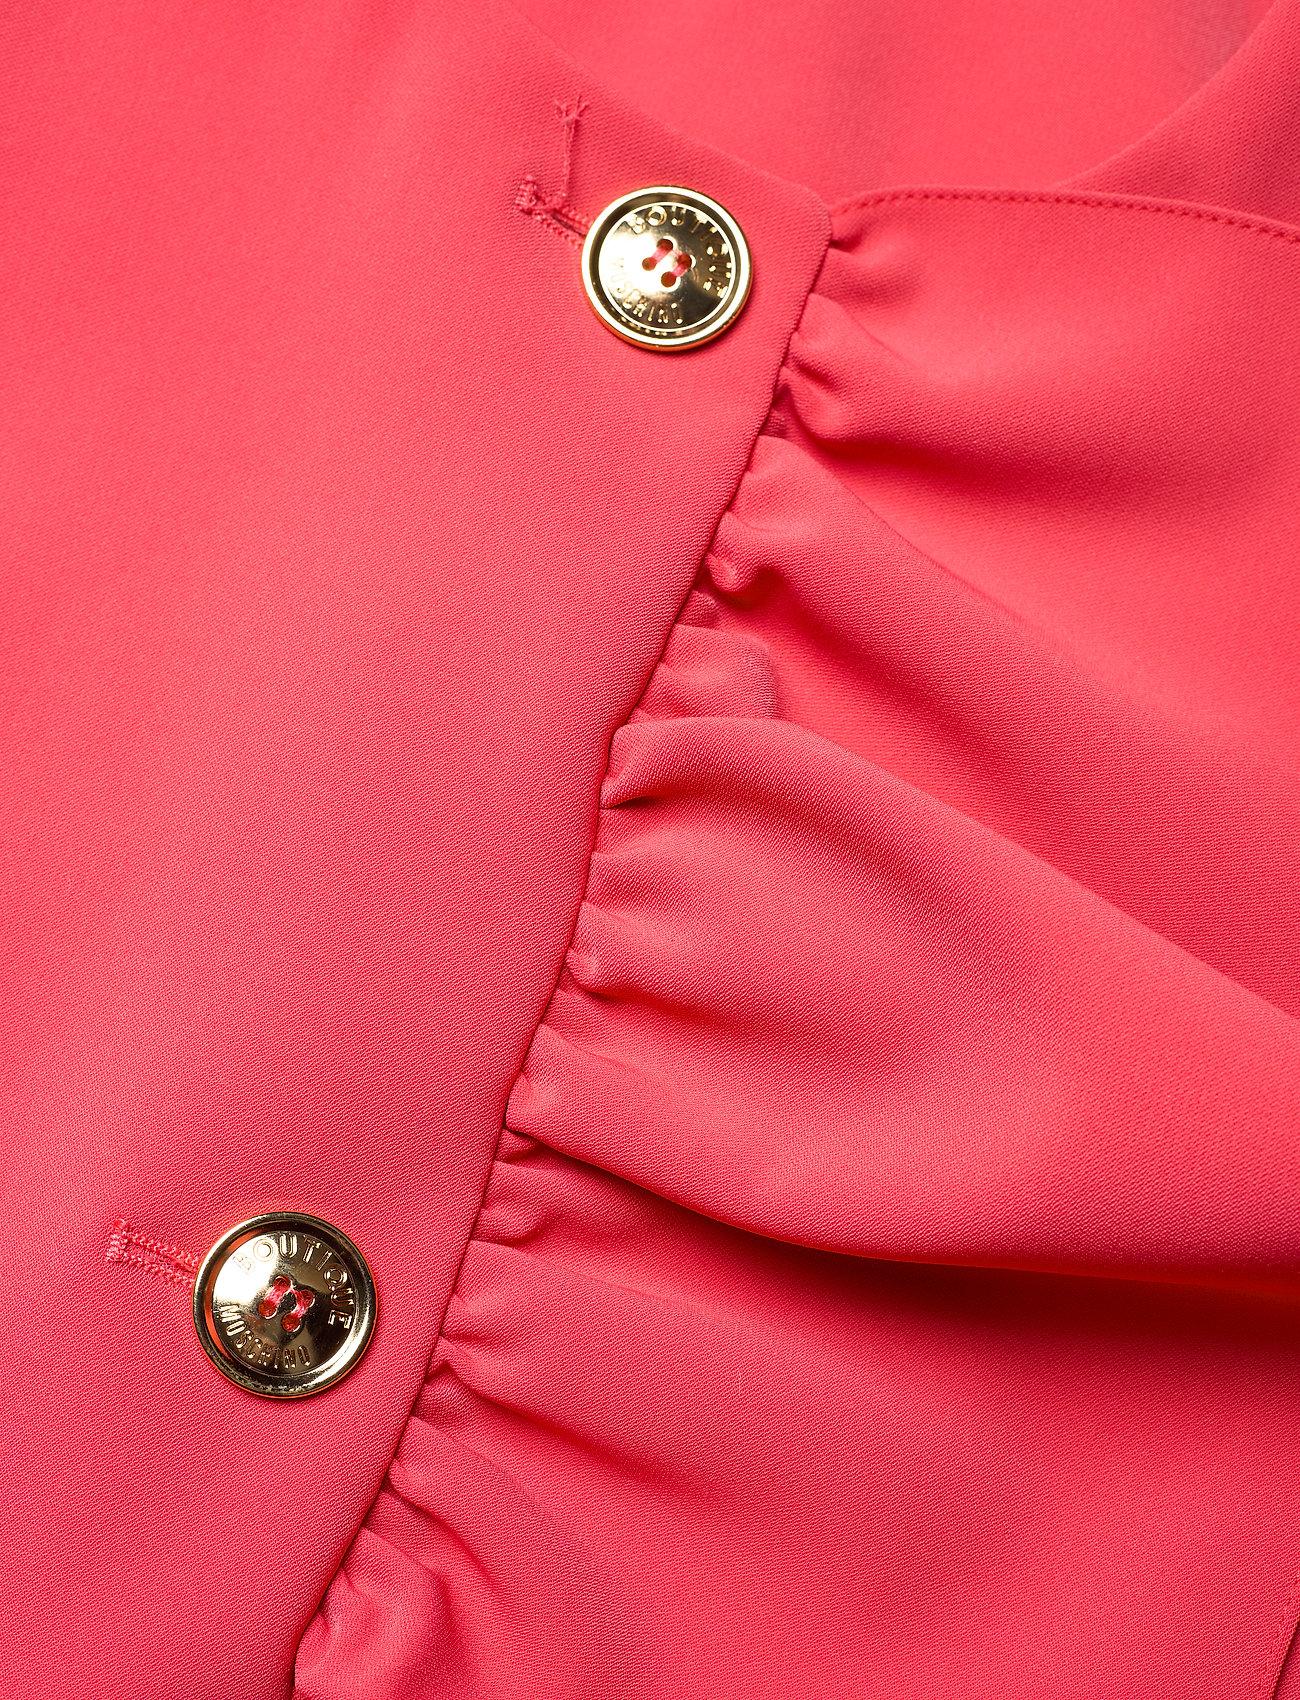 Boutique Moschino - Boutique Moschino JACKET - tøj - pink - 2